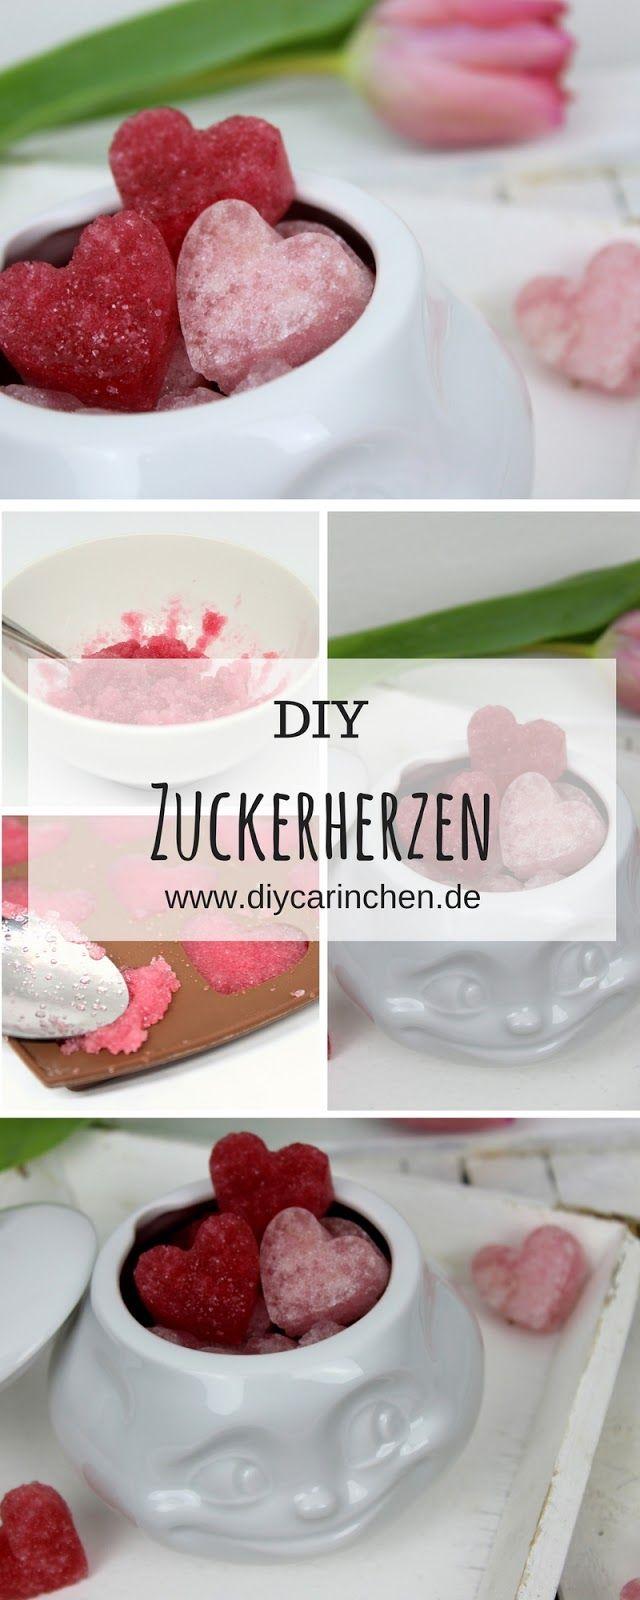 Diy Zuckerherzen In Rosa Selber Machen Süßes Geschenk Zum